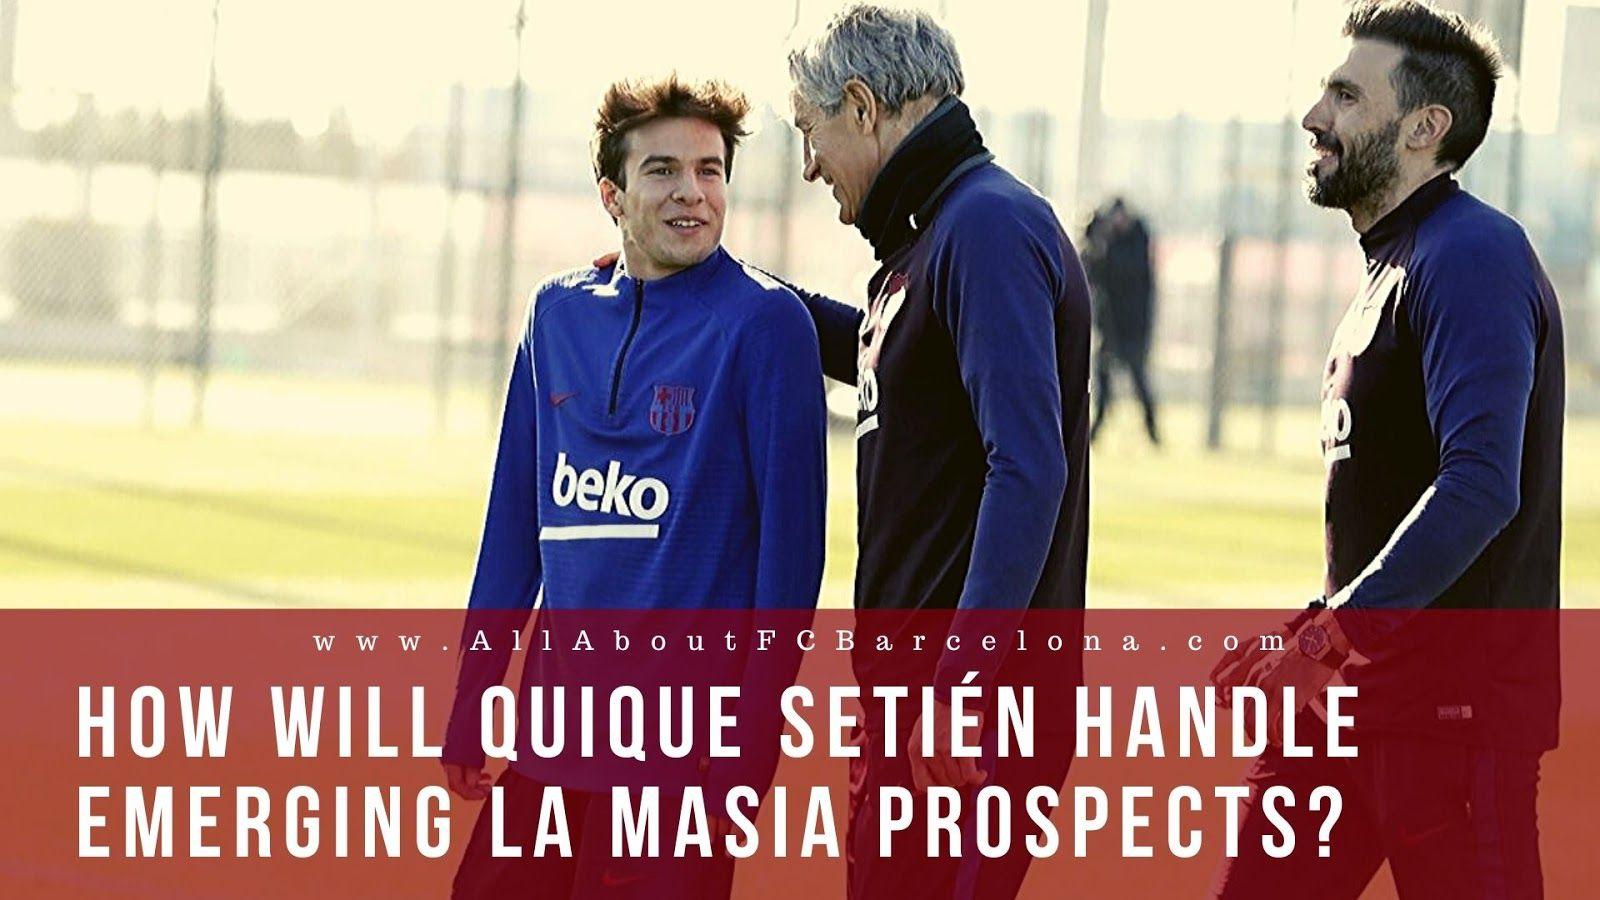 Vidal And La Masia Under Setién, How Will He Handle Them